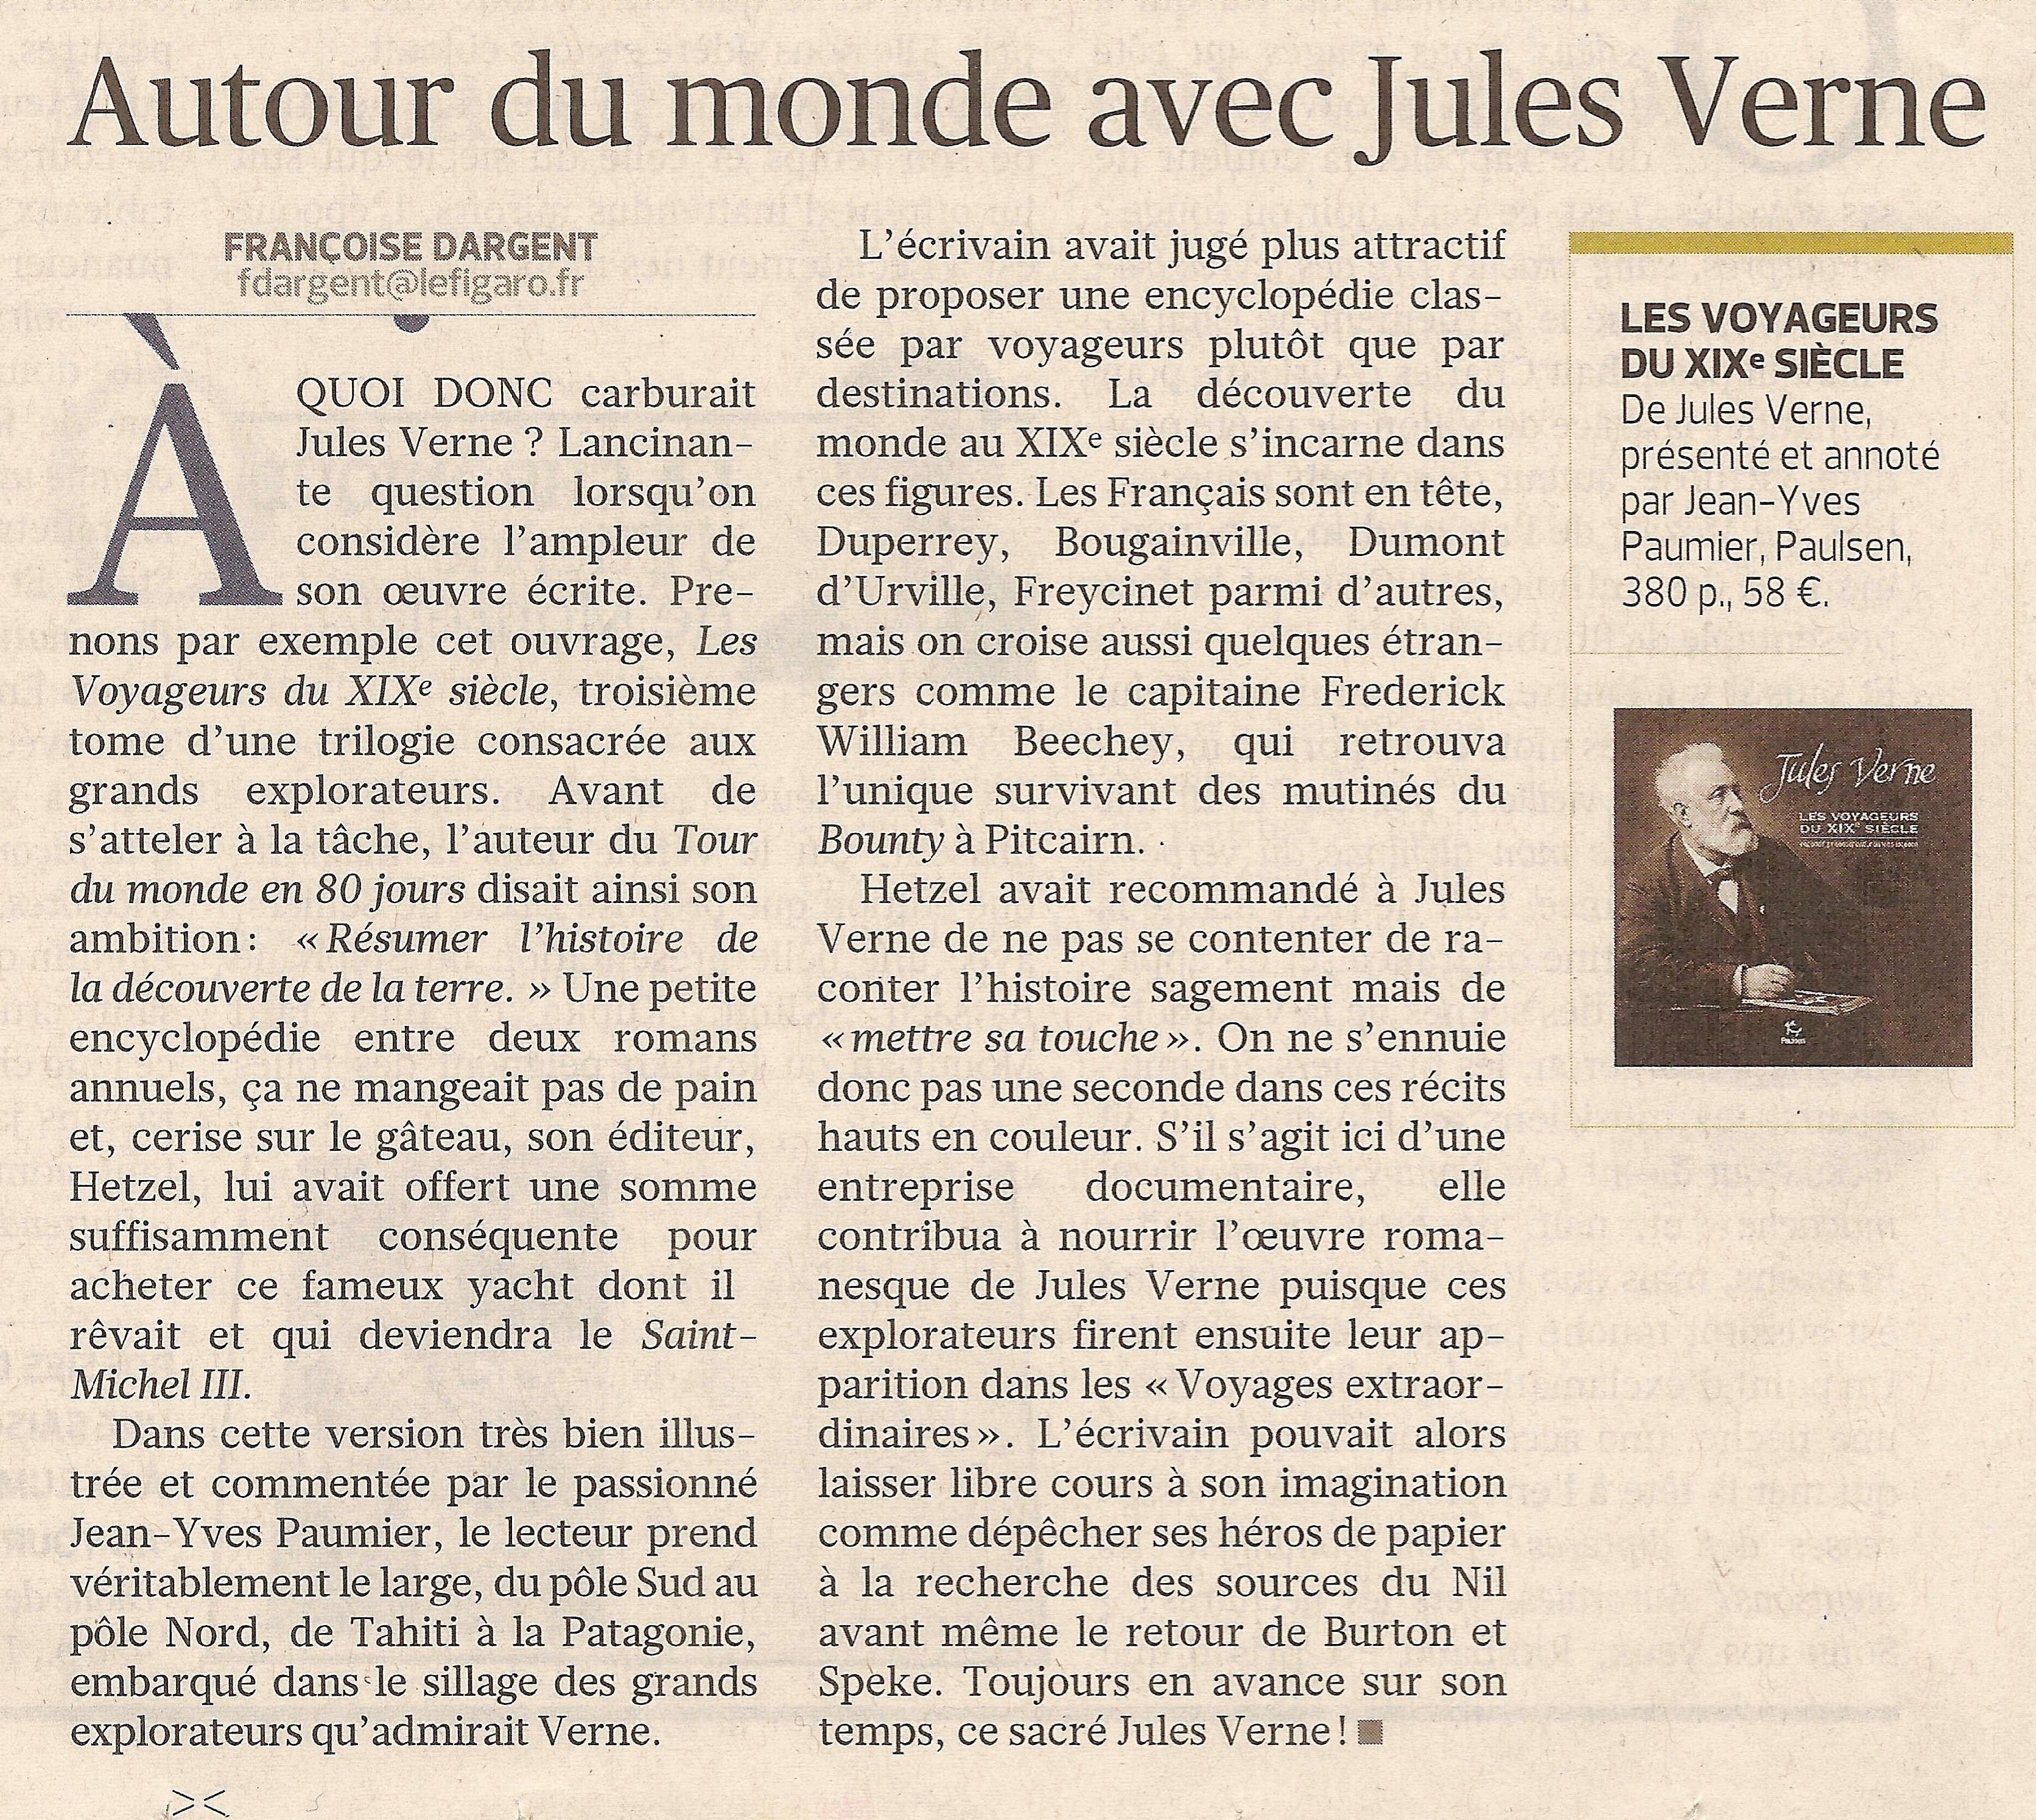 Paumier_Article du Figaro